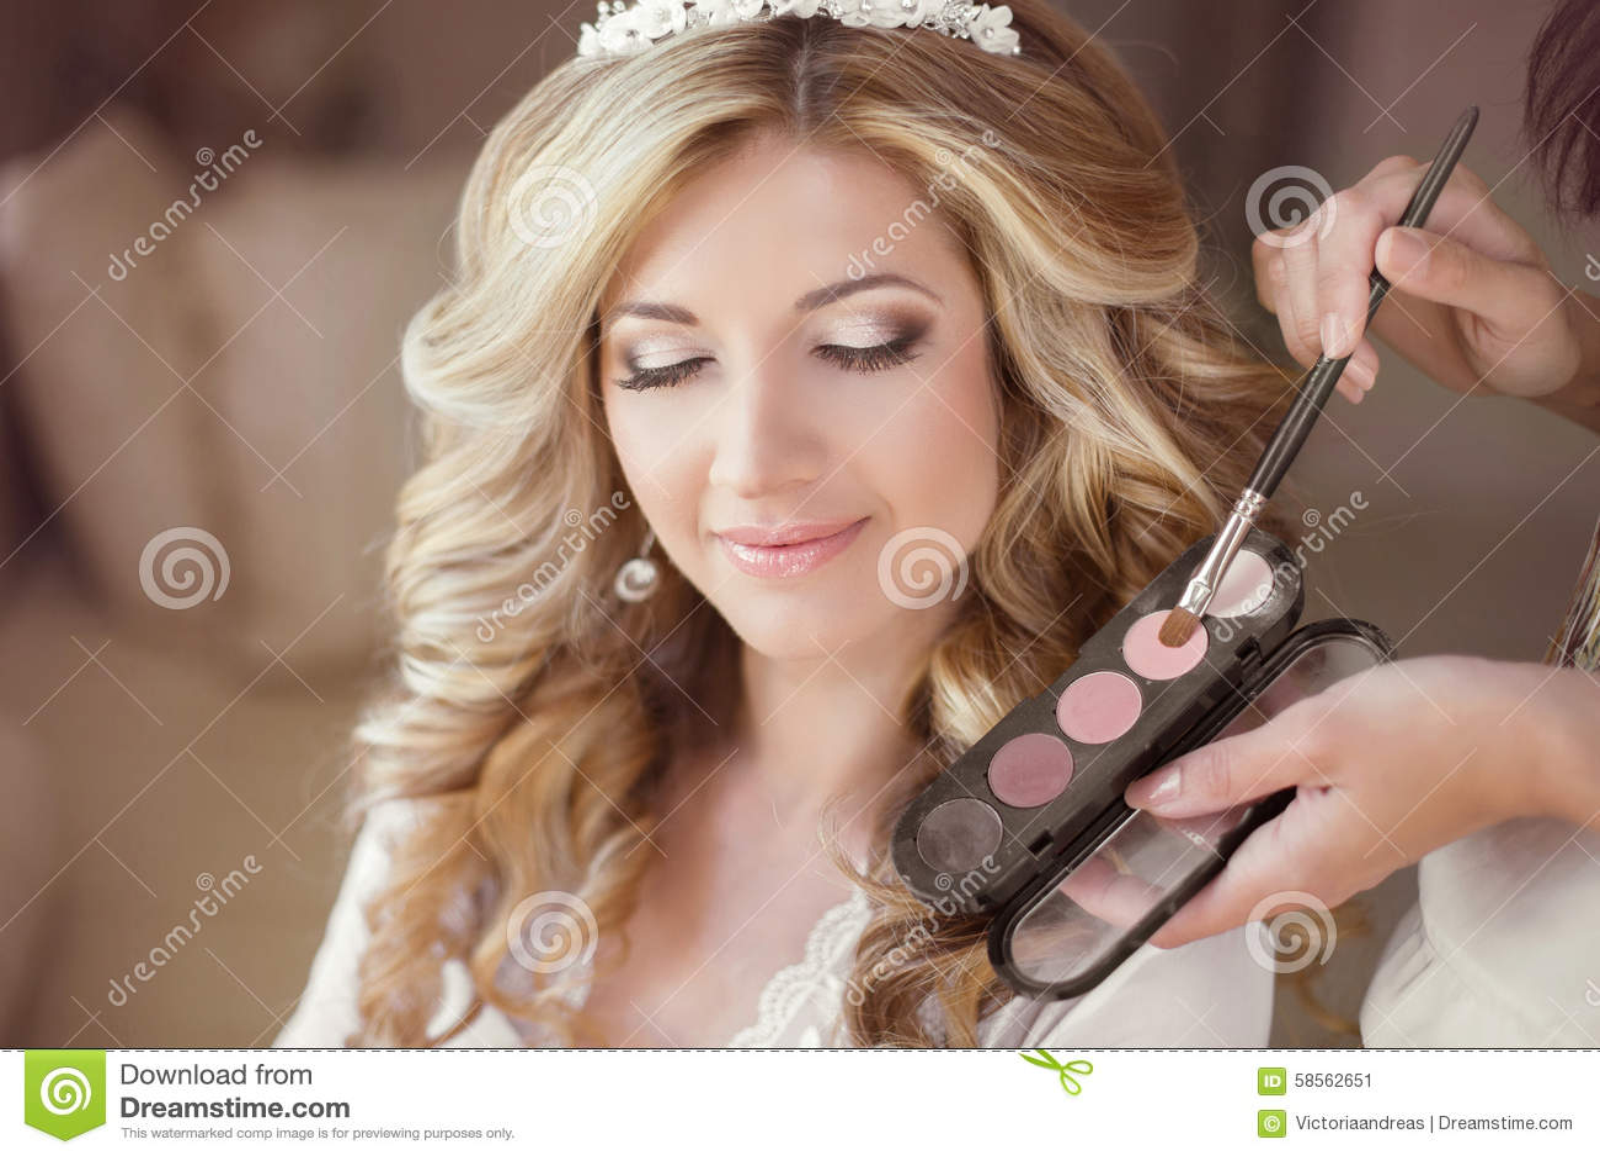 Royalty Free Stock Photo Beautiful Bride With Wedding Makeup